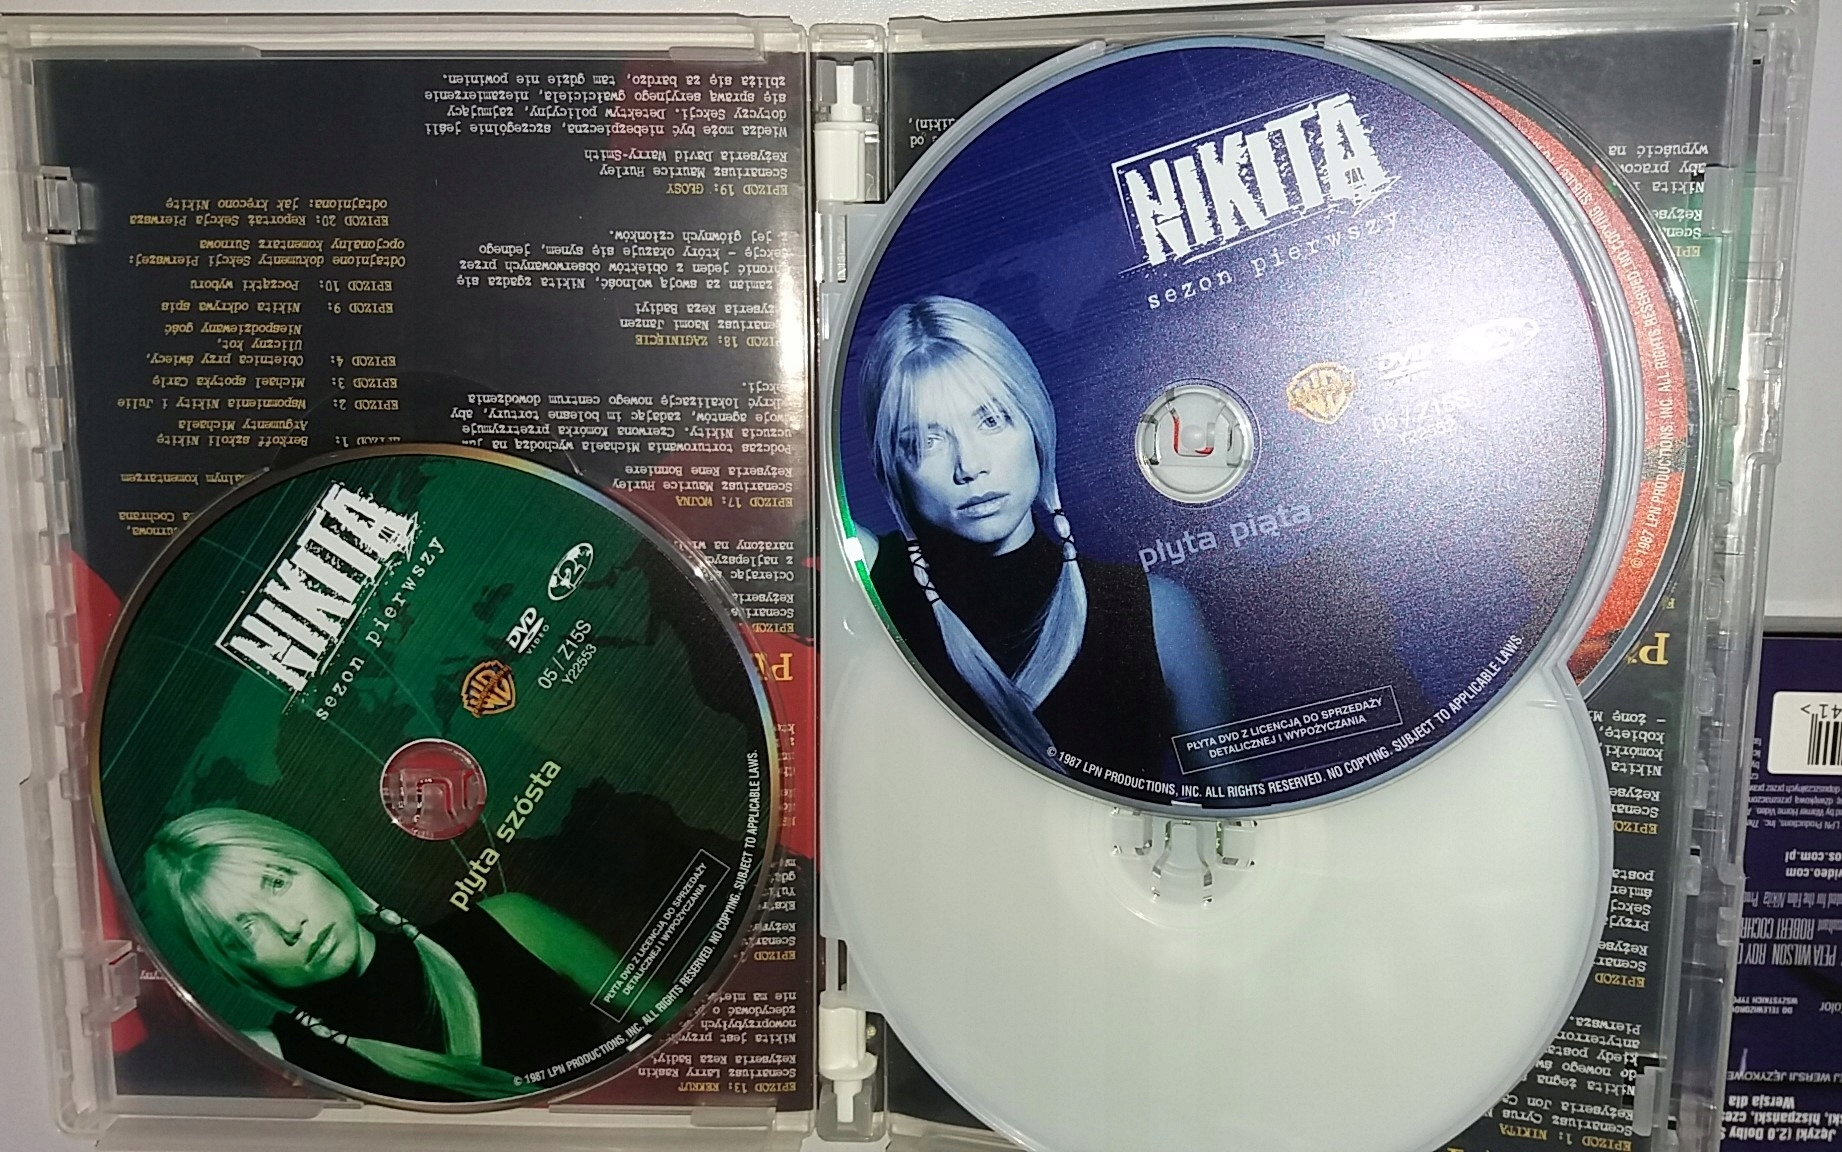 LA FEMME NIKITA SERIAL 1997 SEZON 1 BOX 6 DVD - 7482266304